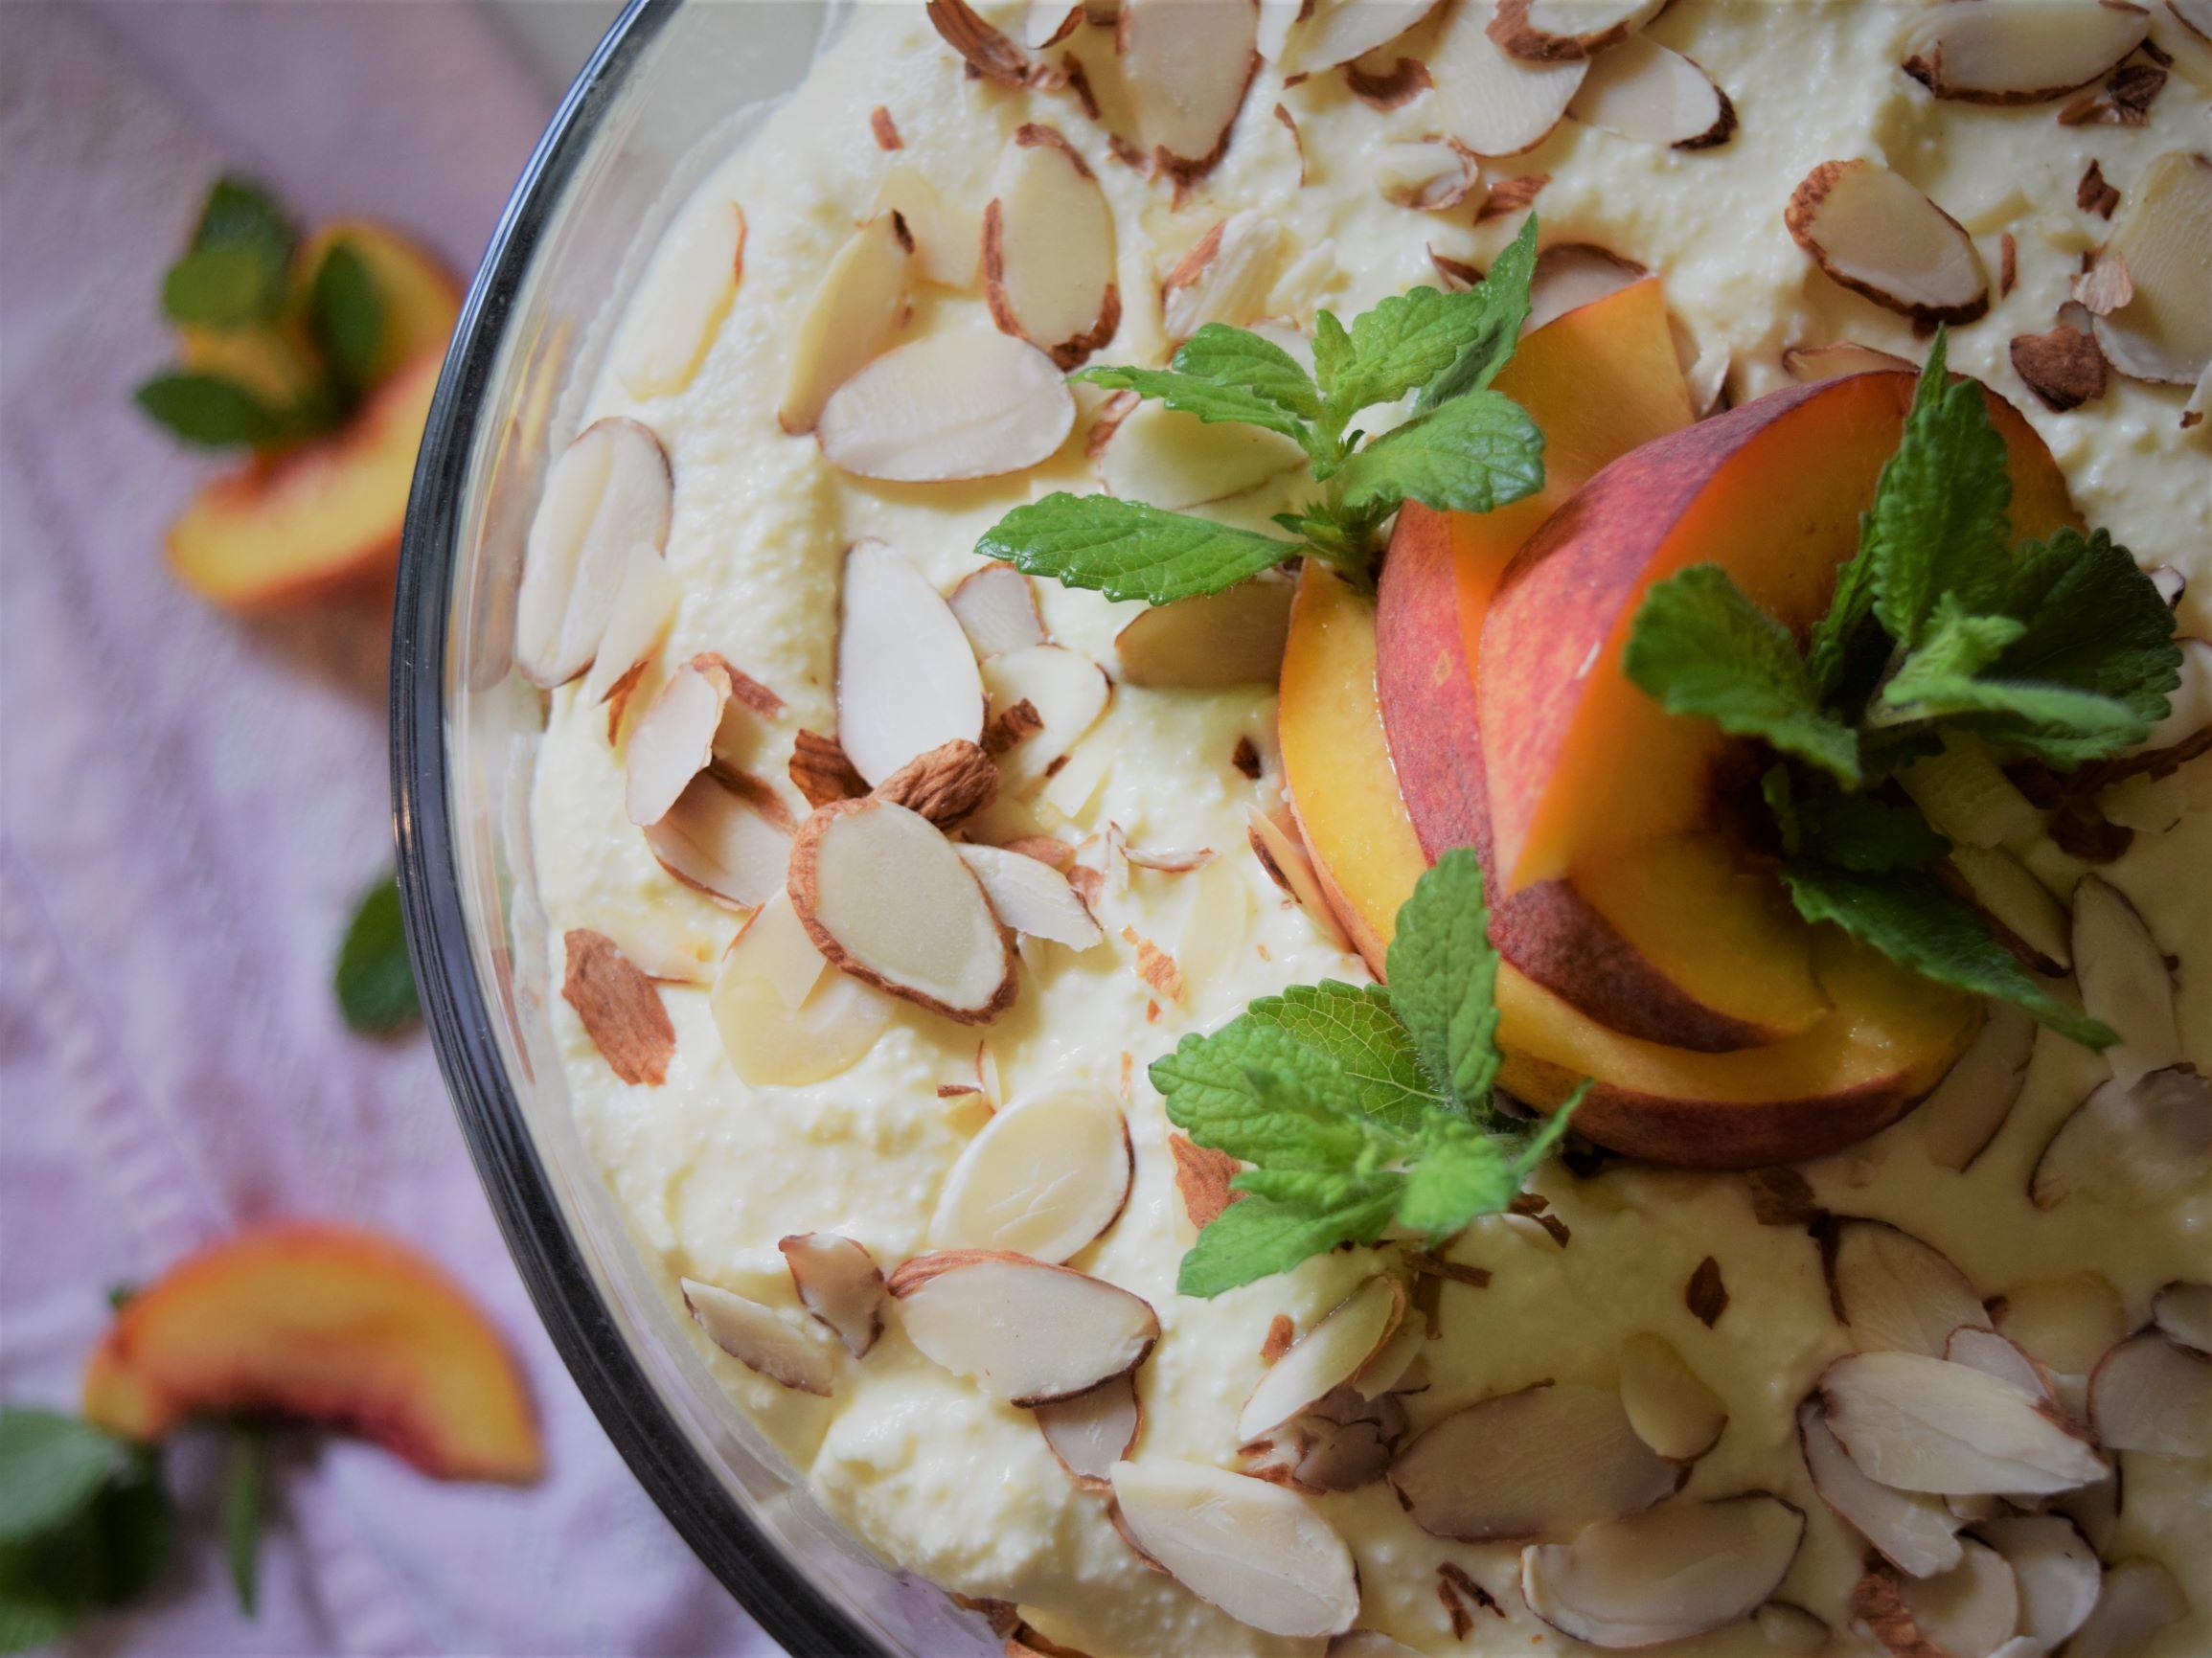 It's Peach Season! Celebrate with a Sunny Twist on Tiramisu